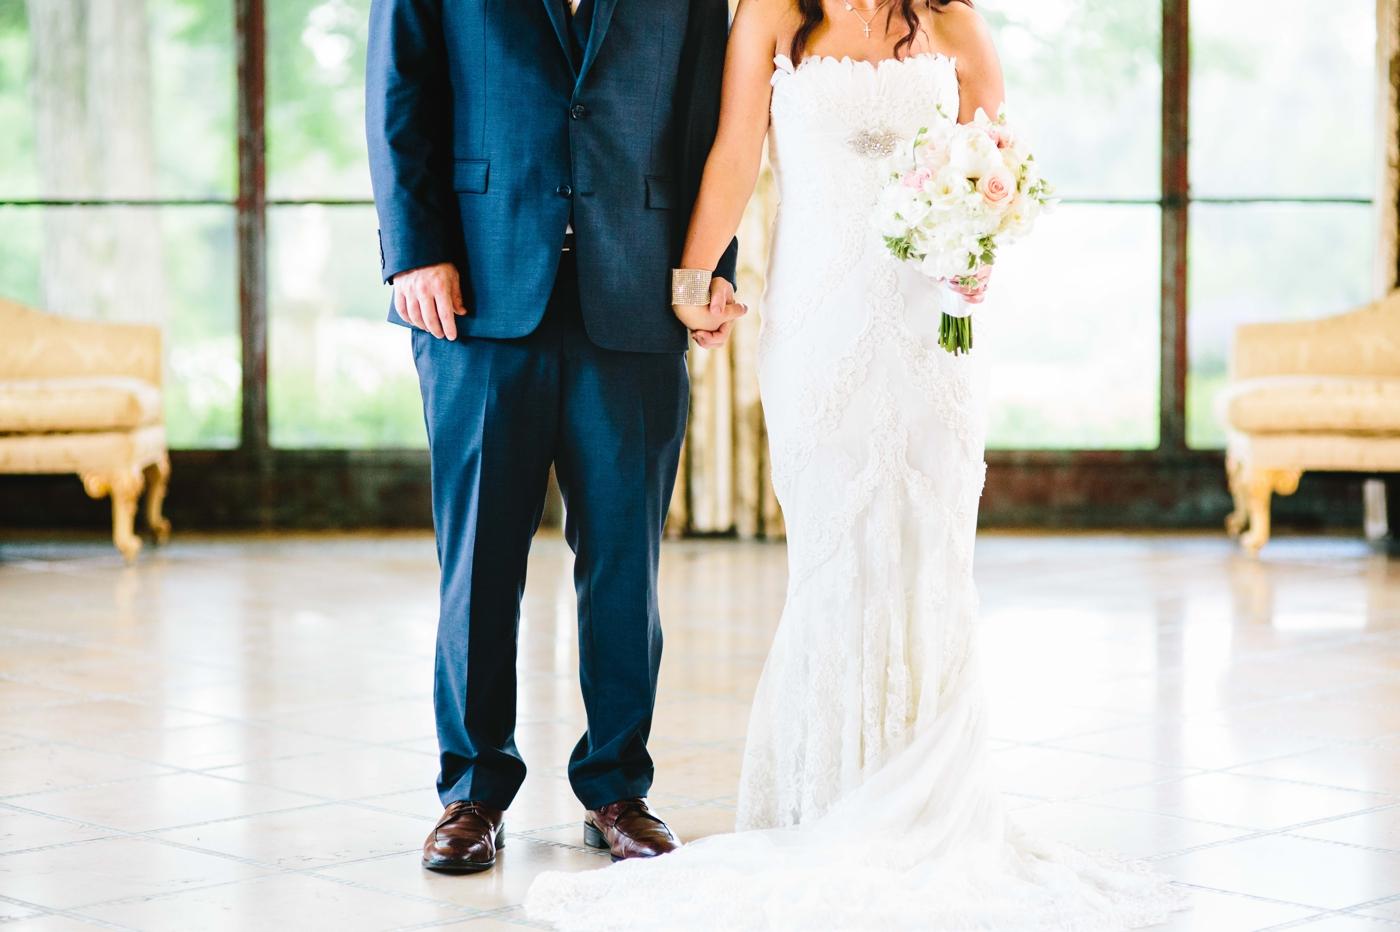 chicago-fine-art-wedding-photography-svihra5